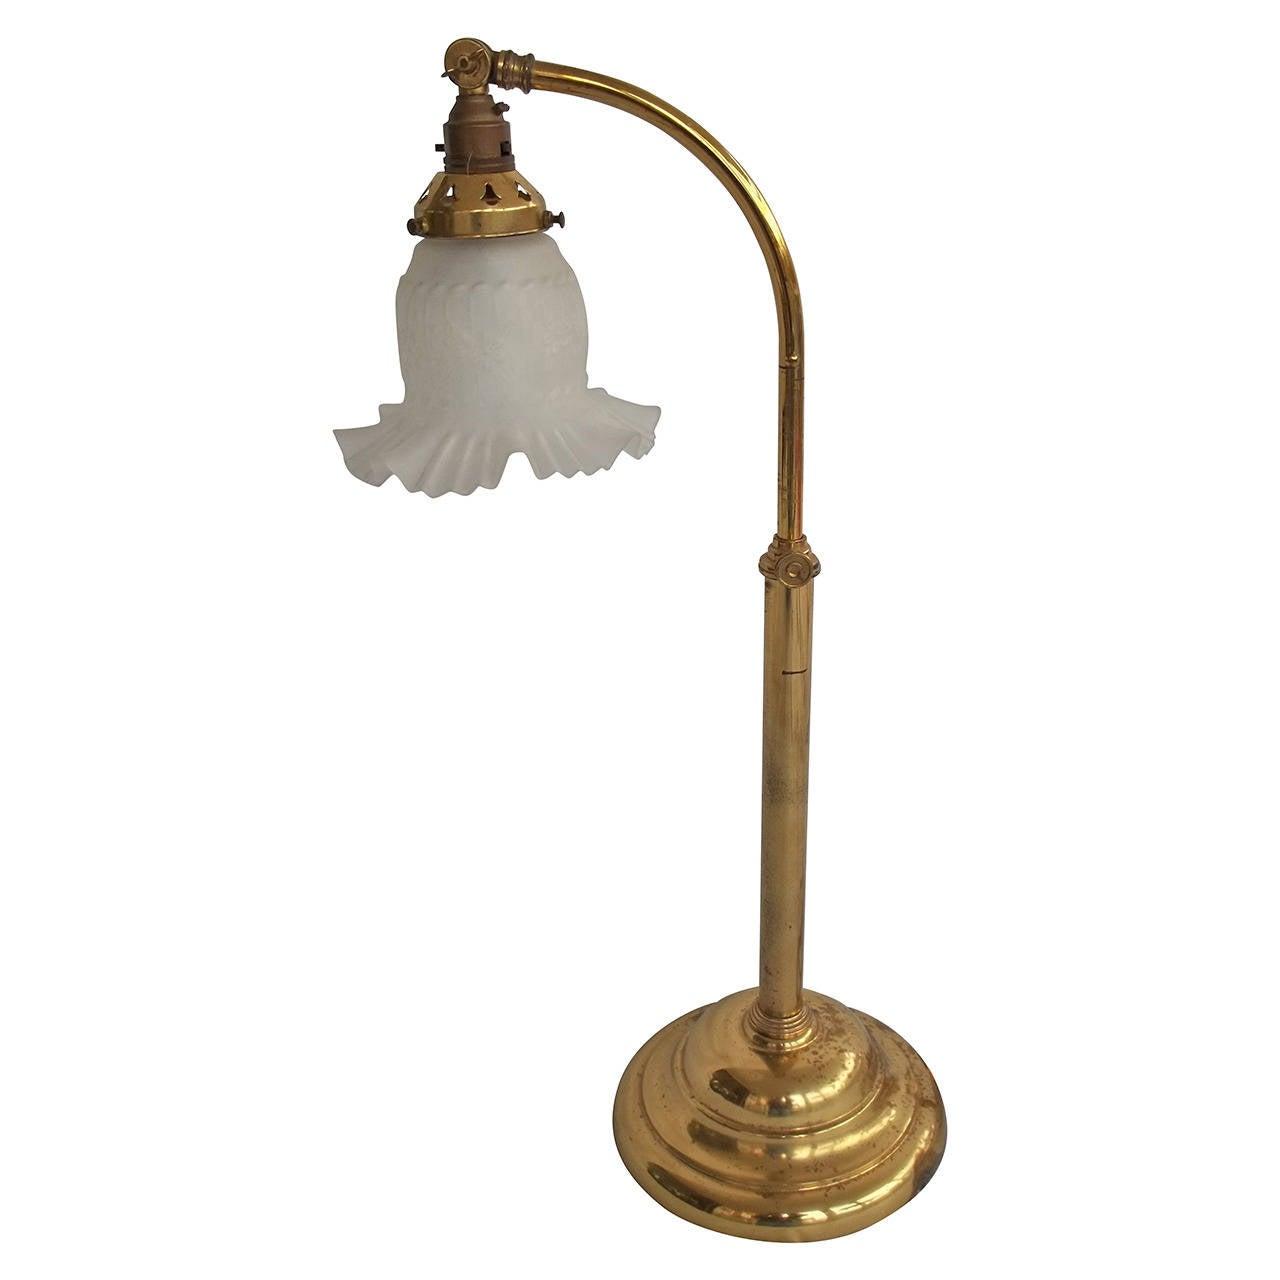 Christopher Wray, English Desk Lamp, Adjustable, Brass, Circa 1960u0027s 1